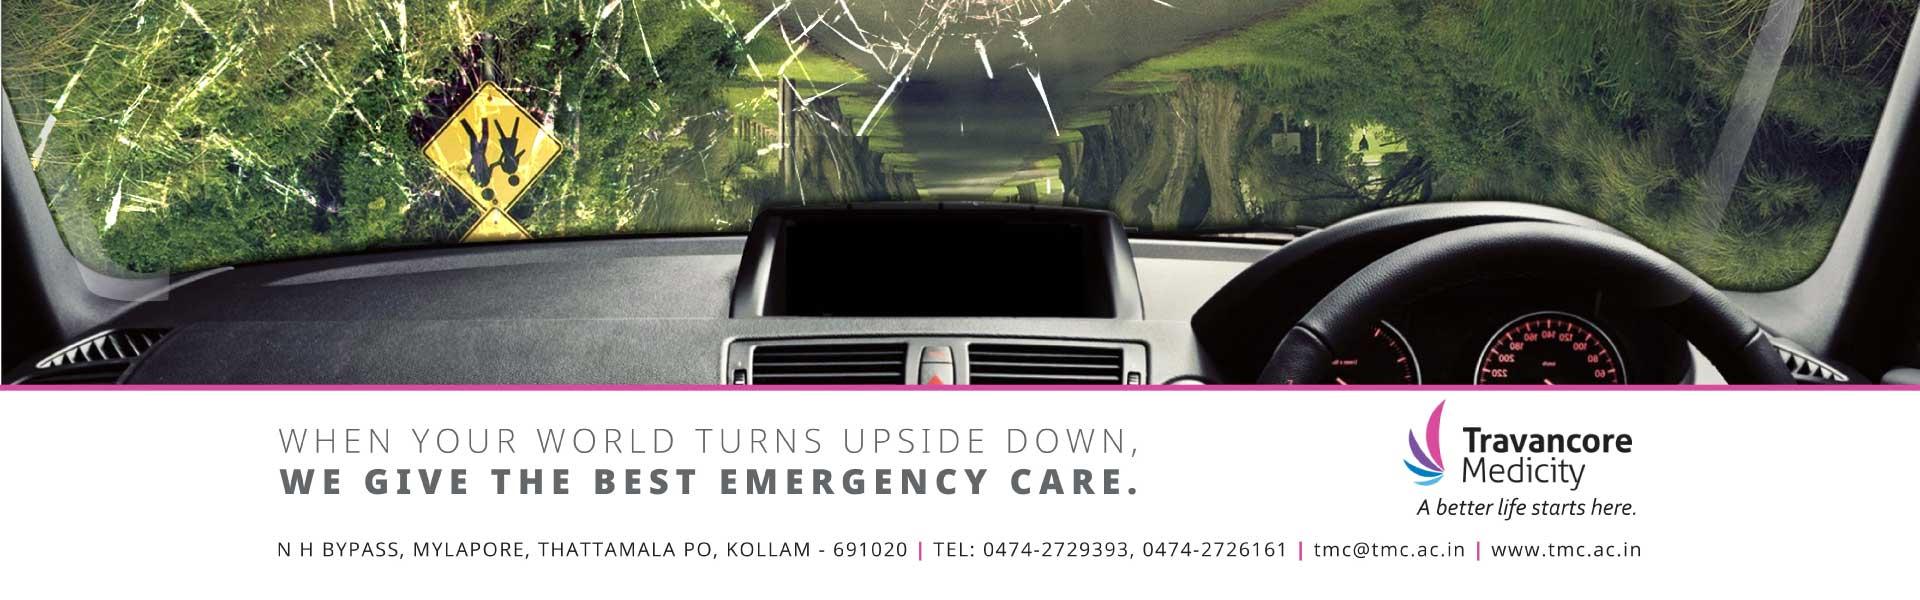 Emergency Care Banner | travancore Medicity